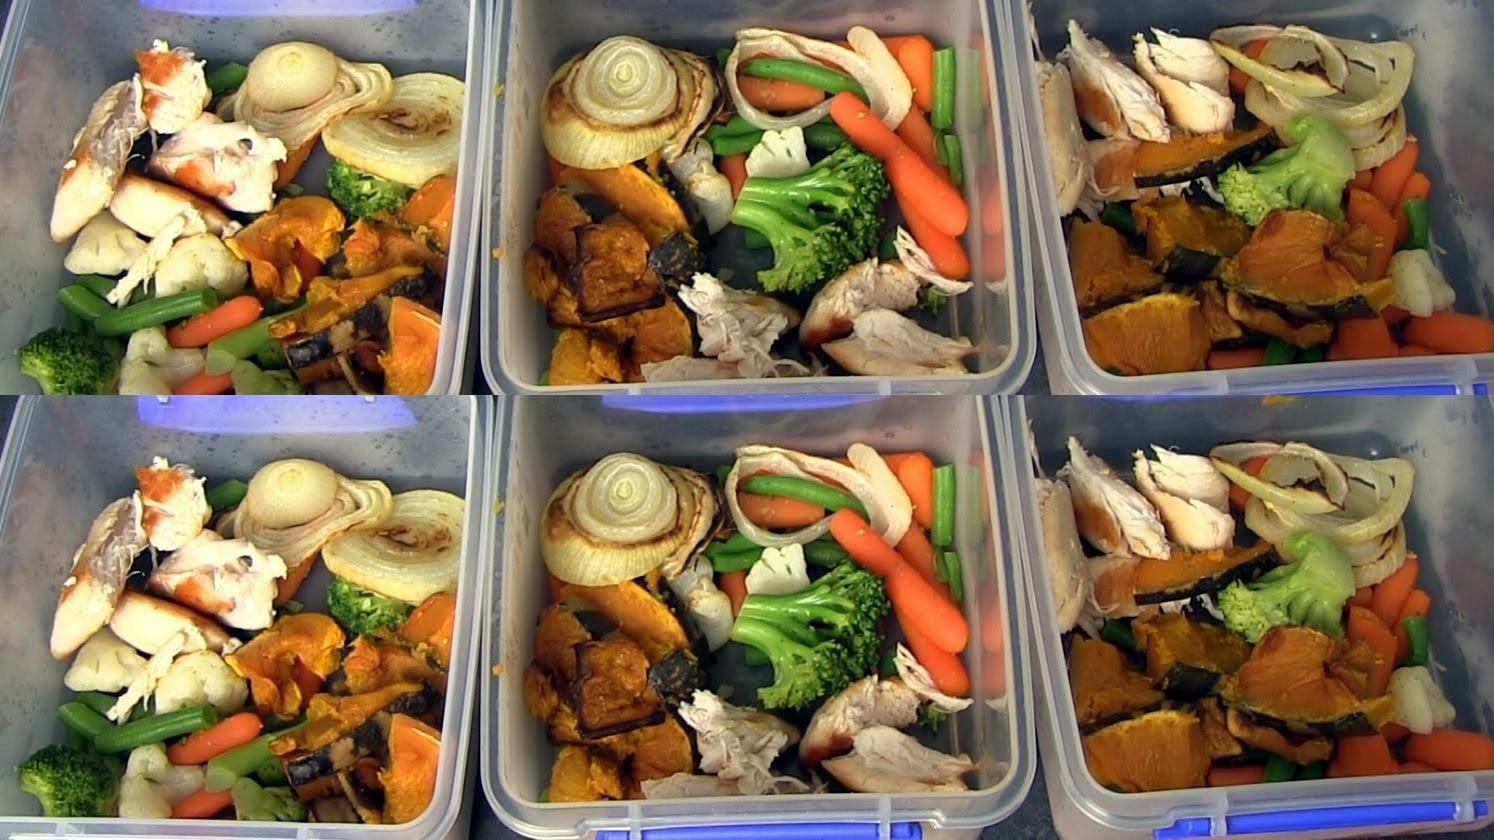 preparacion de comida